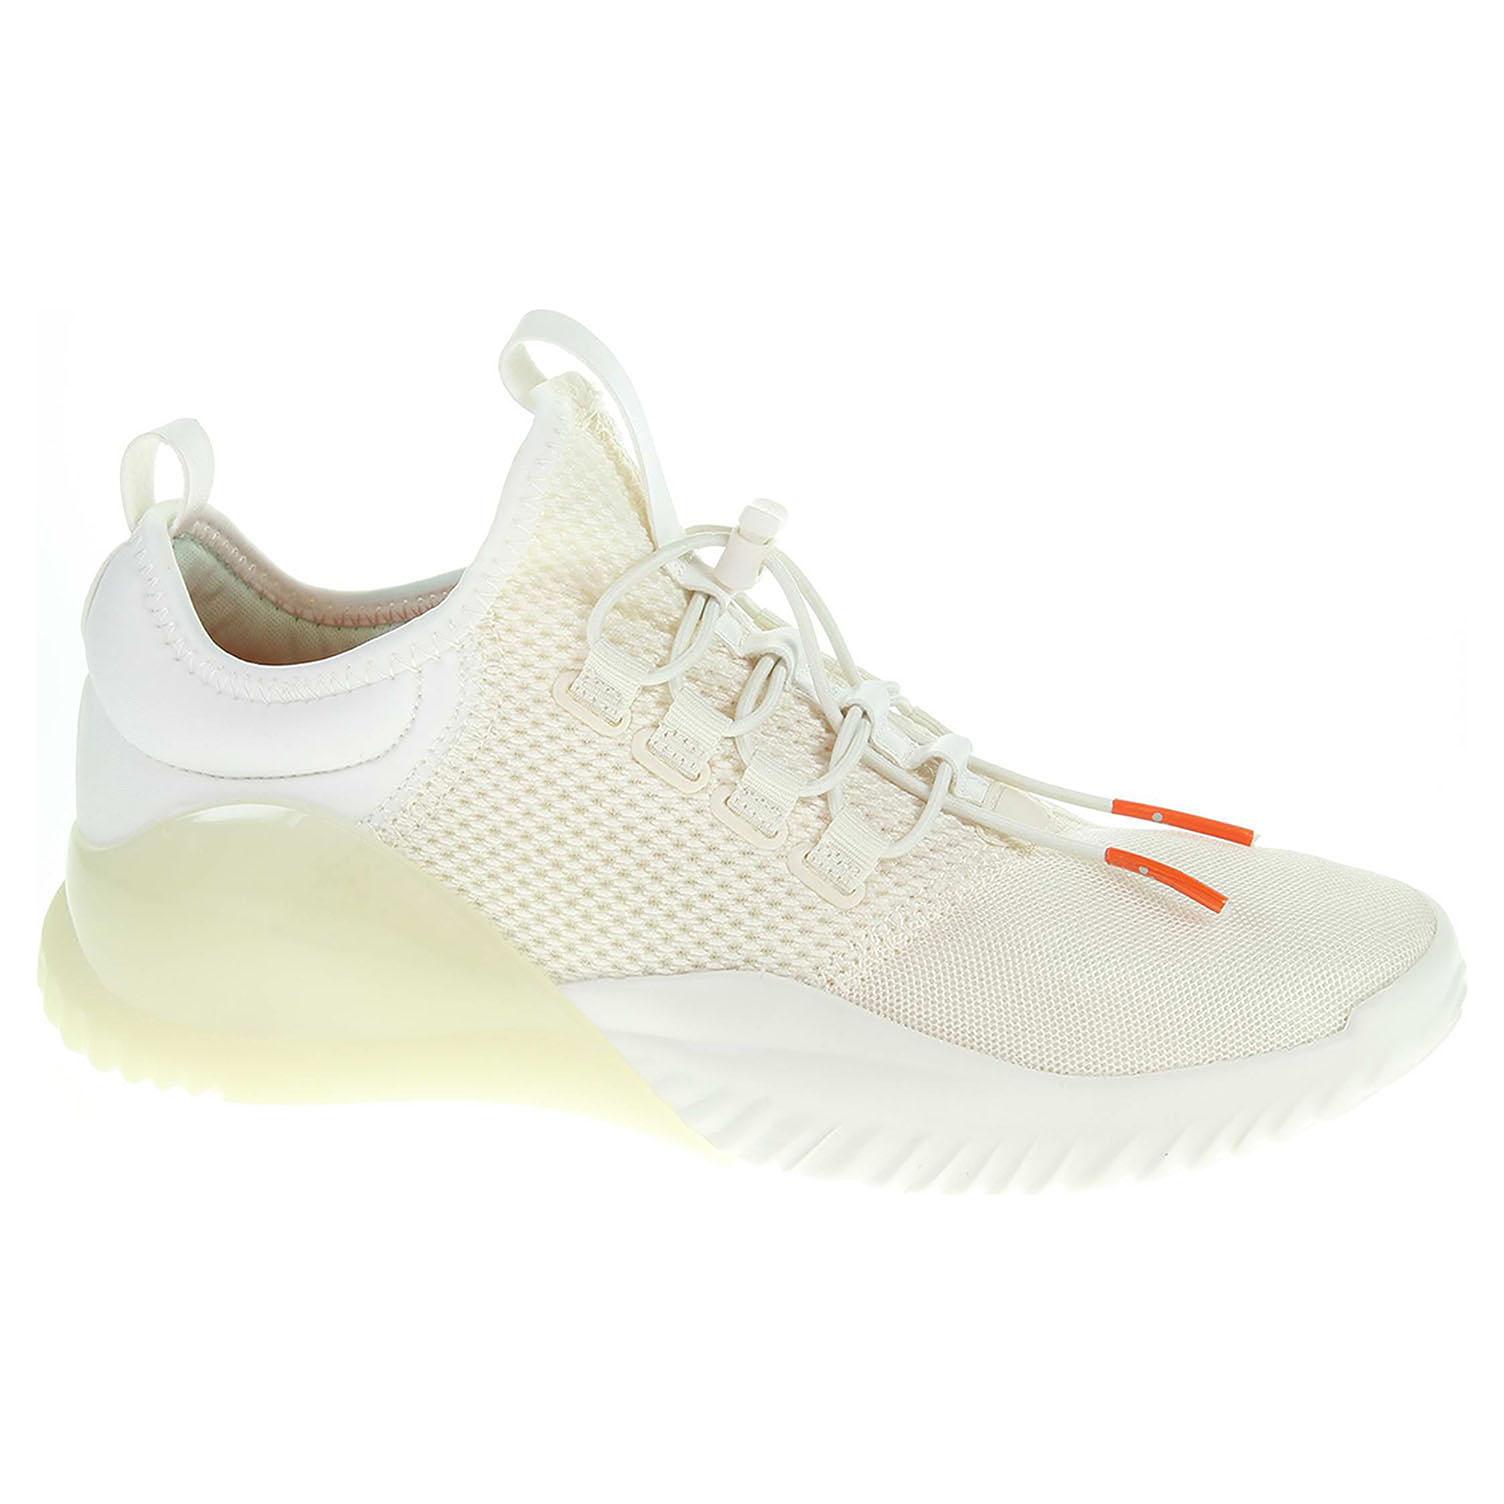 Dámská obuv Tamaris 1-23720-20 white 1-1-23720-20 100 39